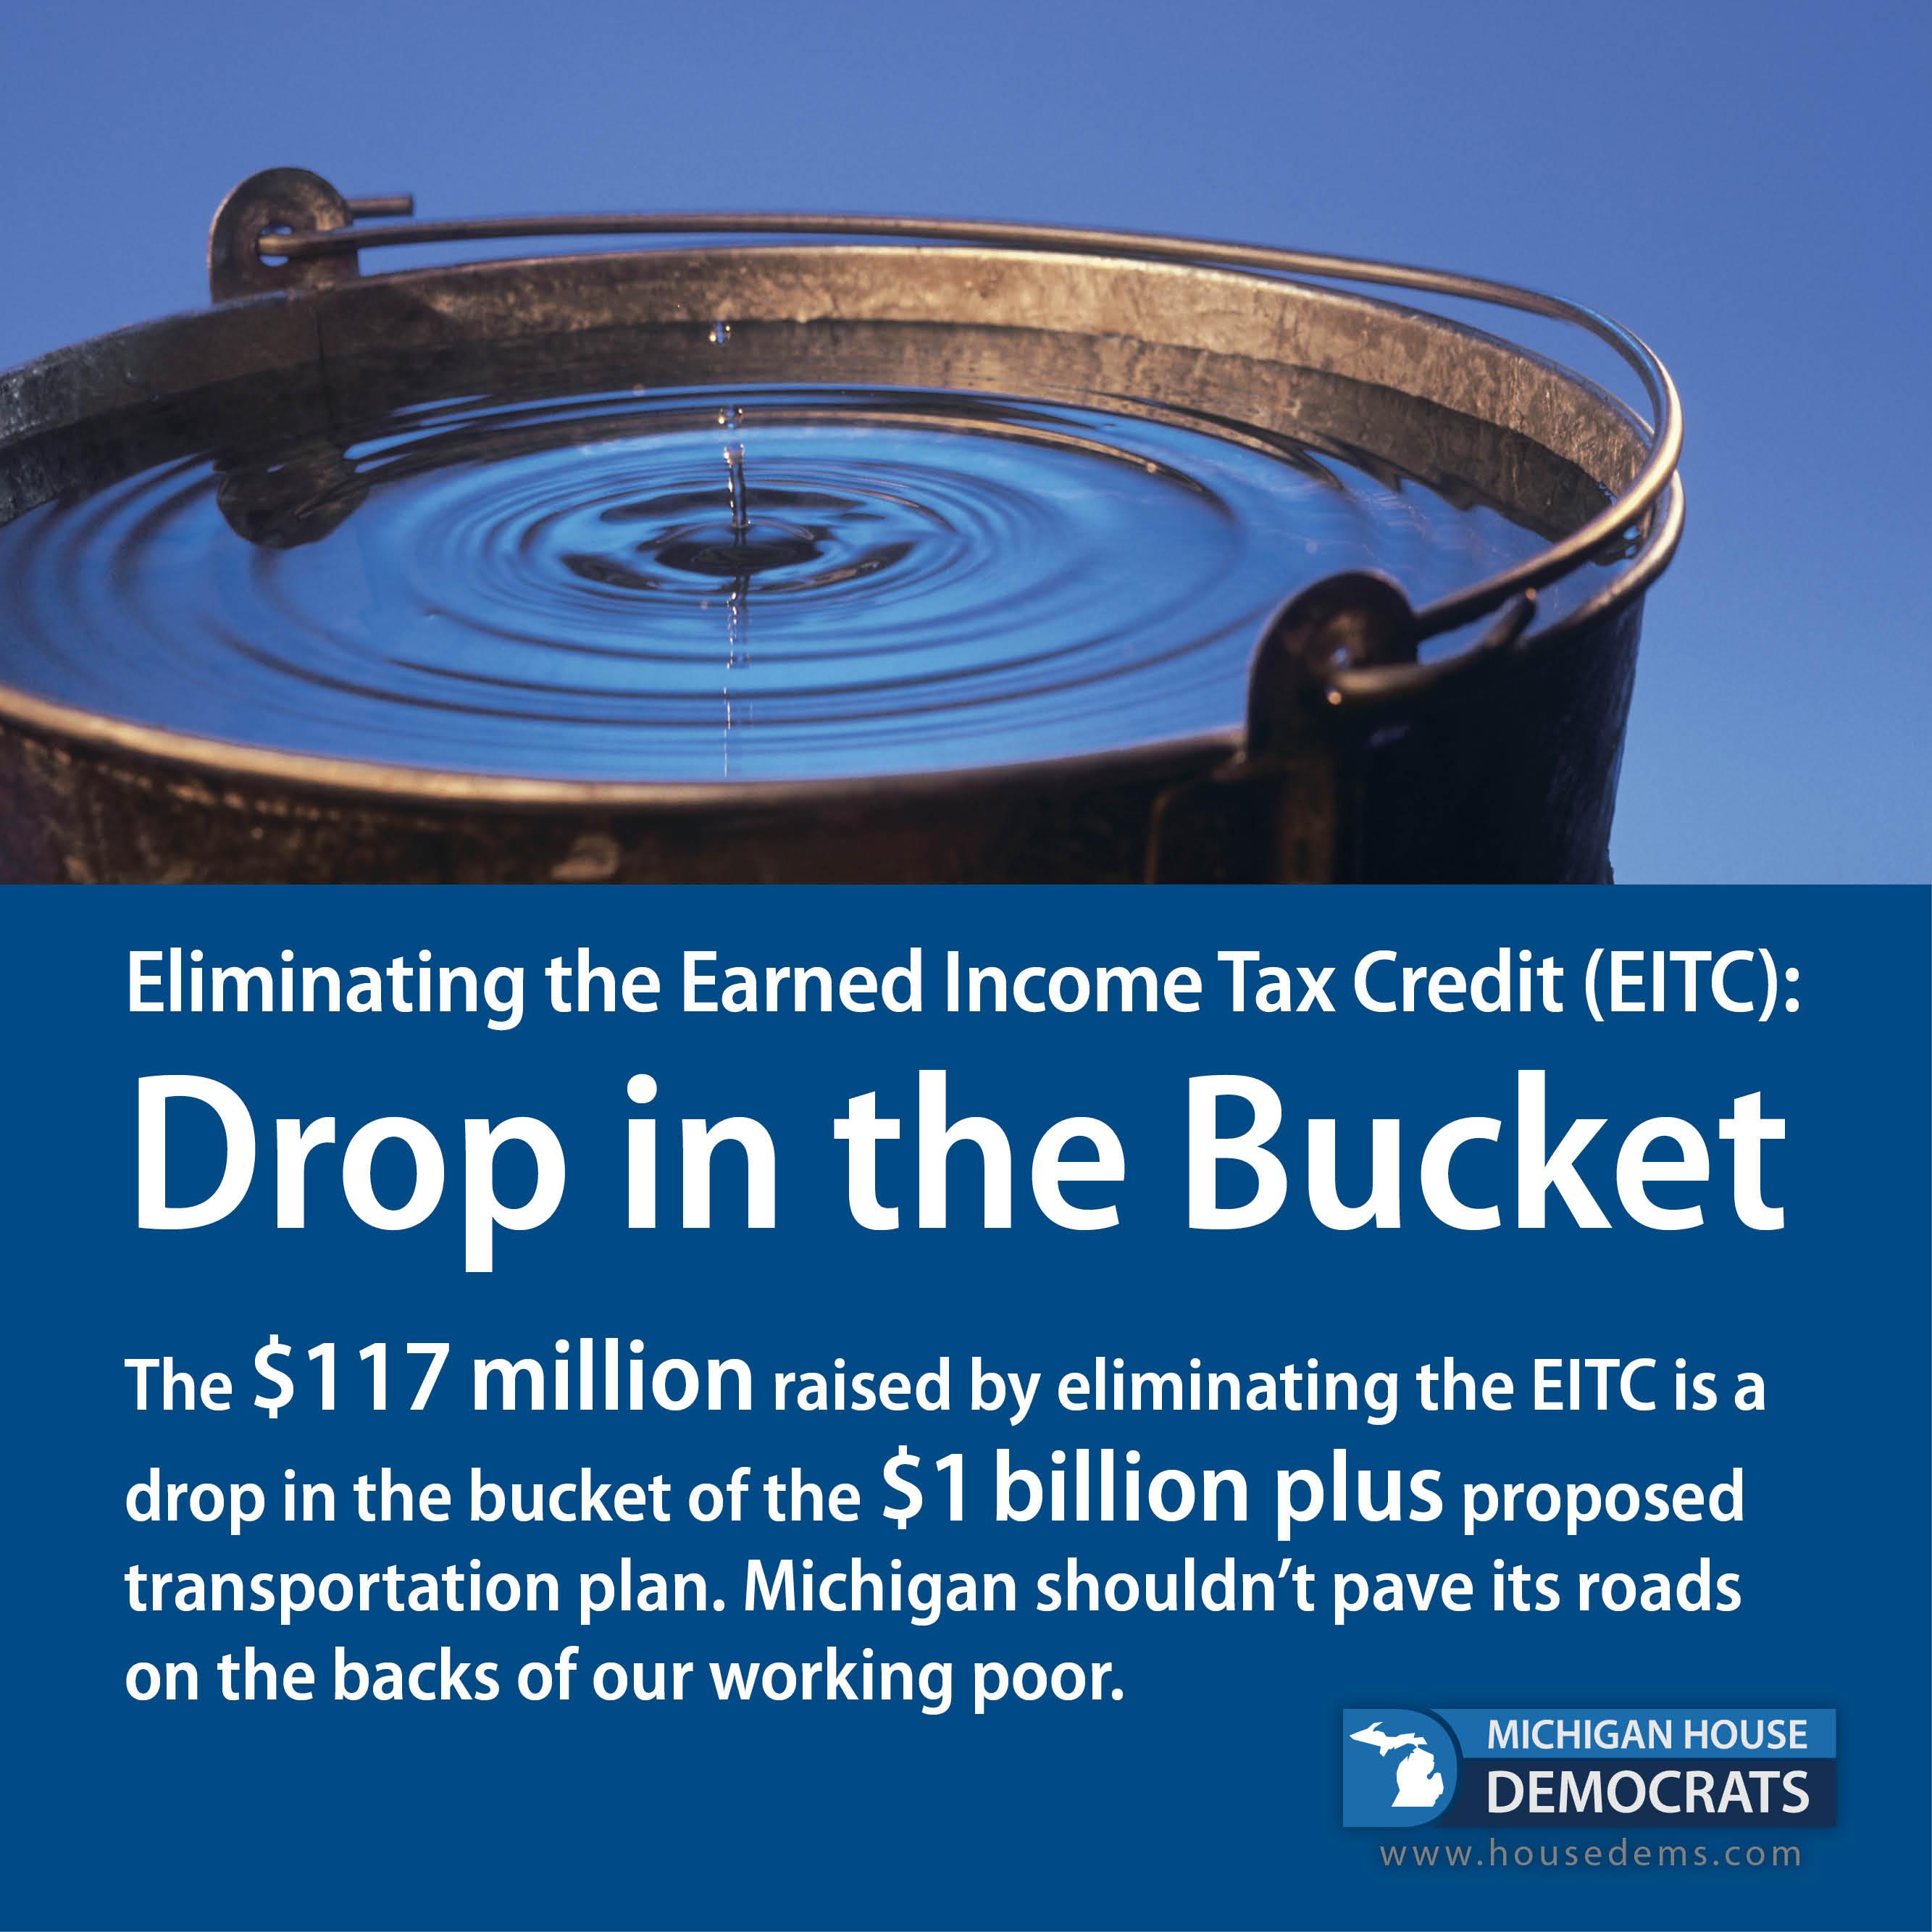 Savemieitc a drop in the bucket